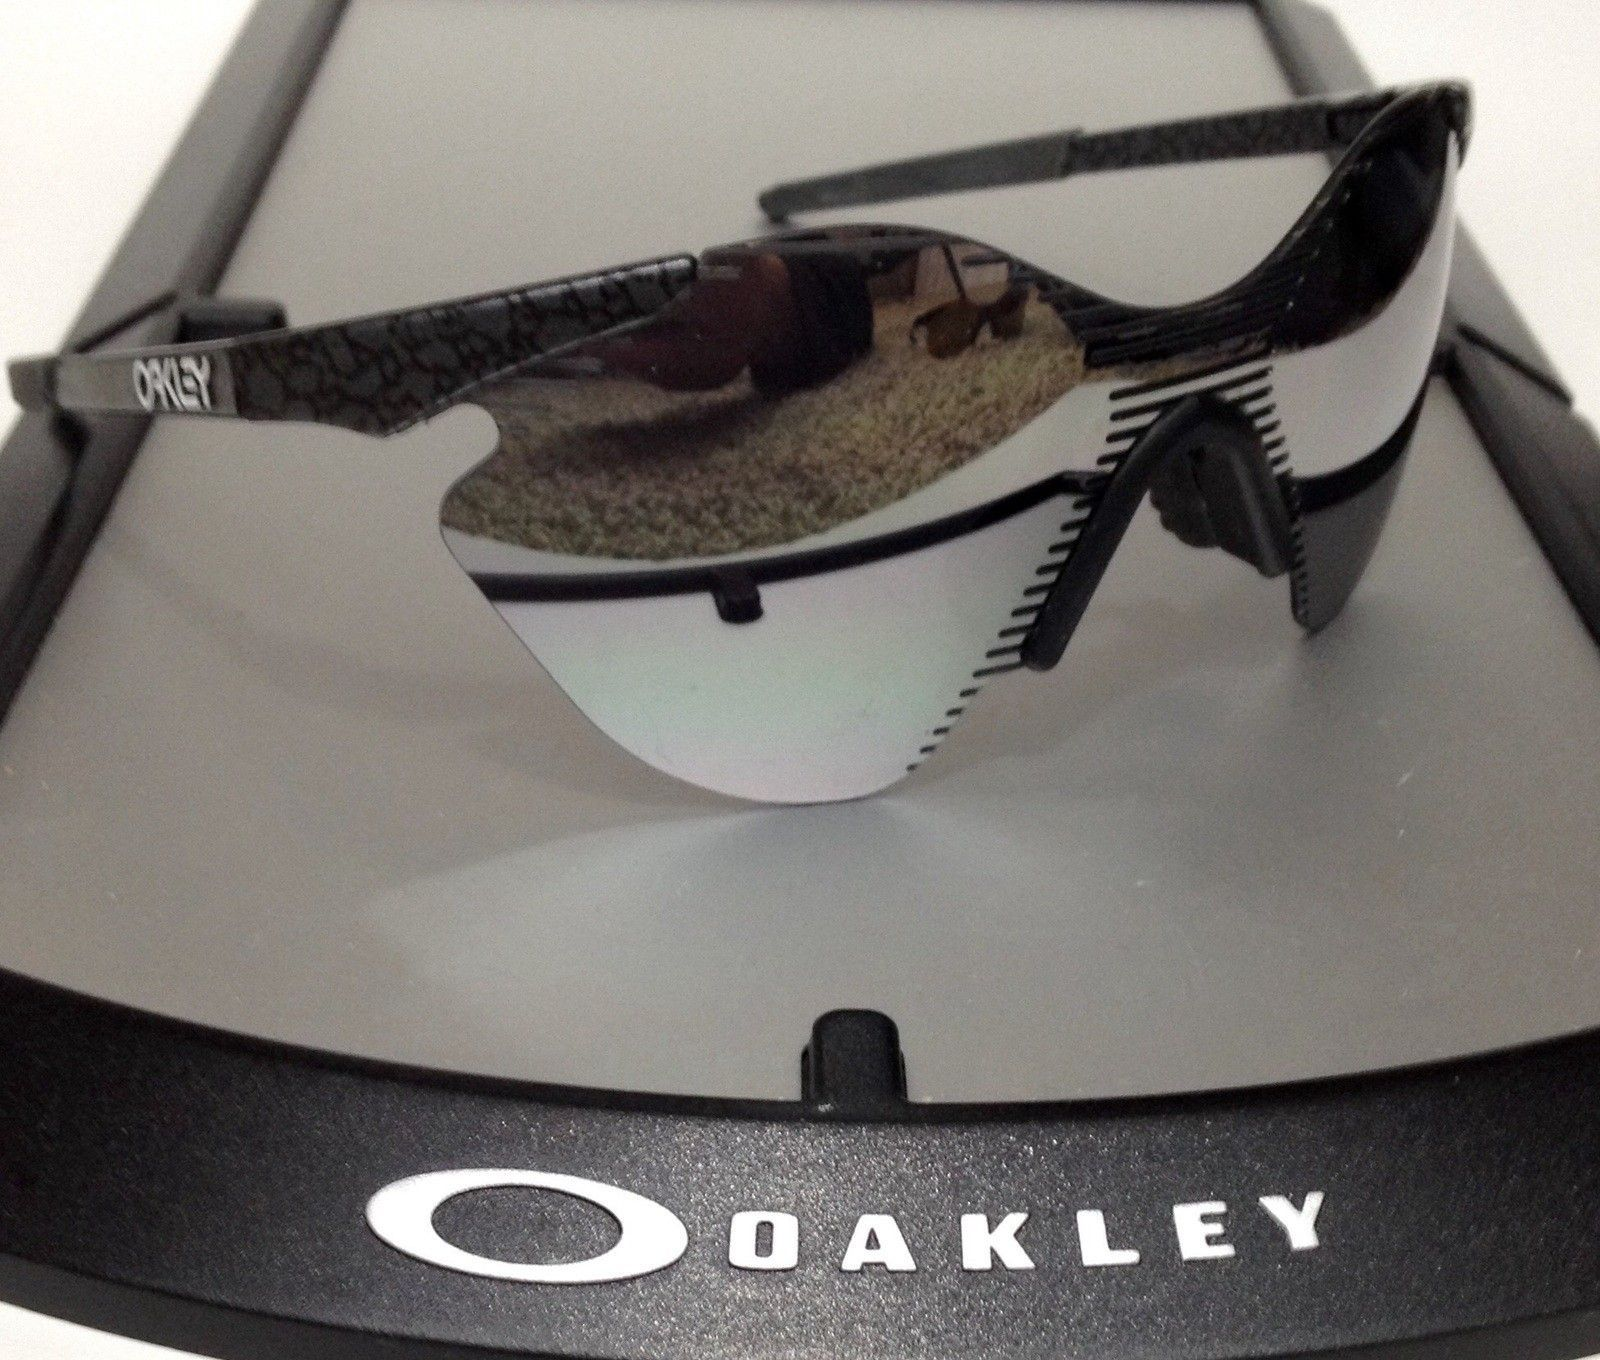 Zero + Zero + Zero + Zero + Zero + Zero = Oakley - image.jpg